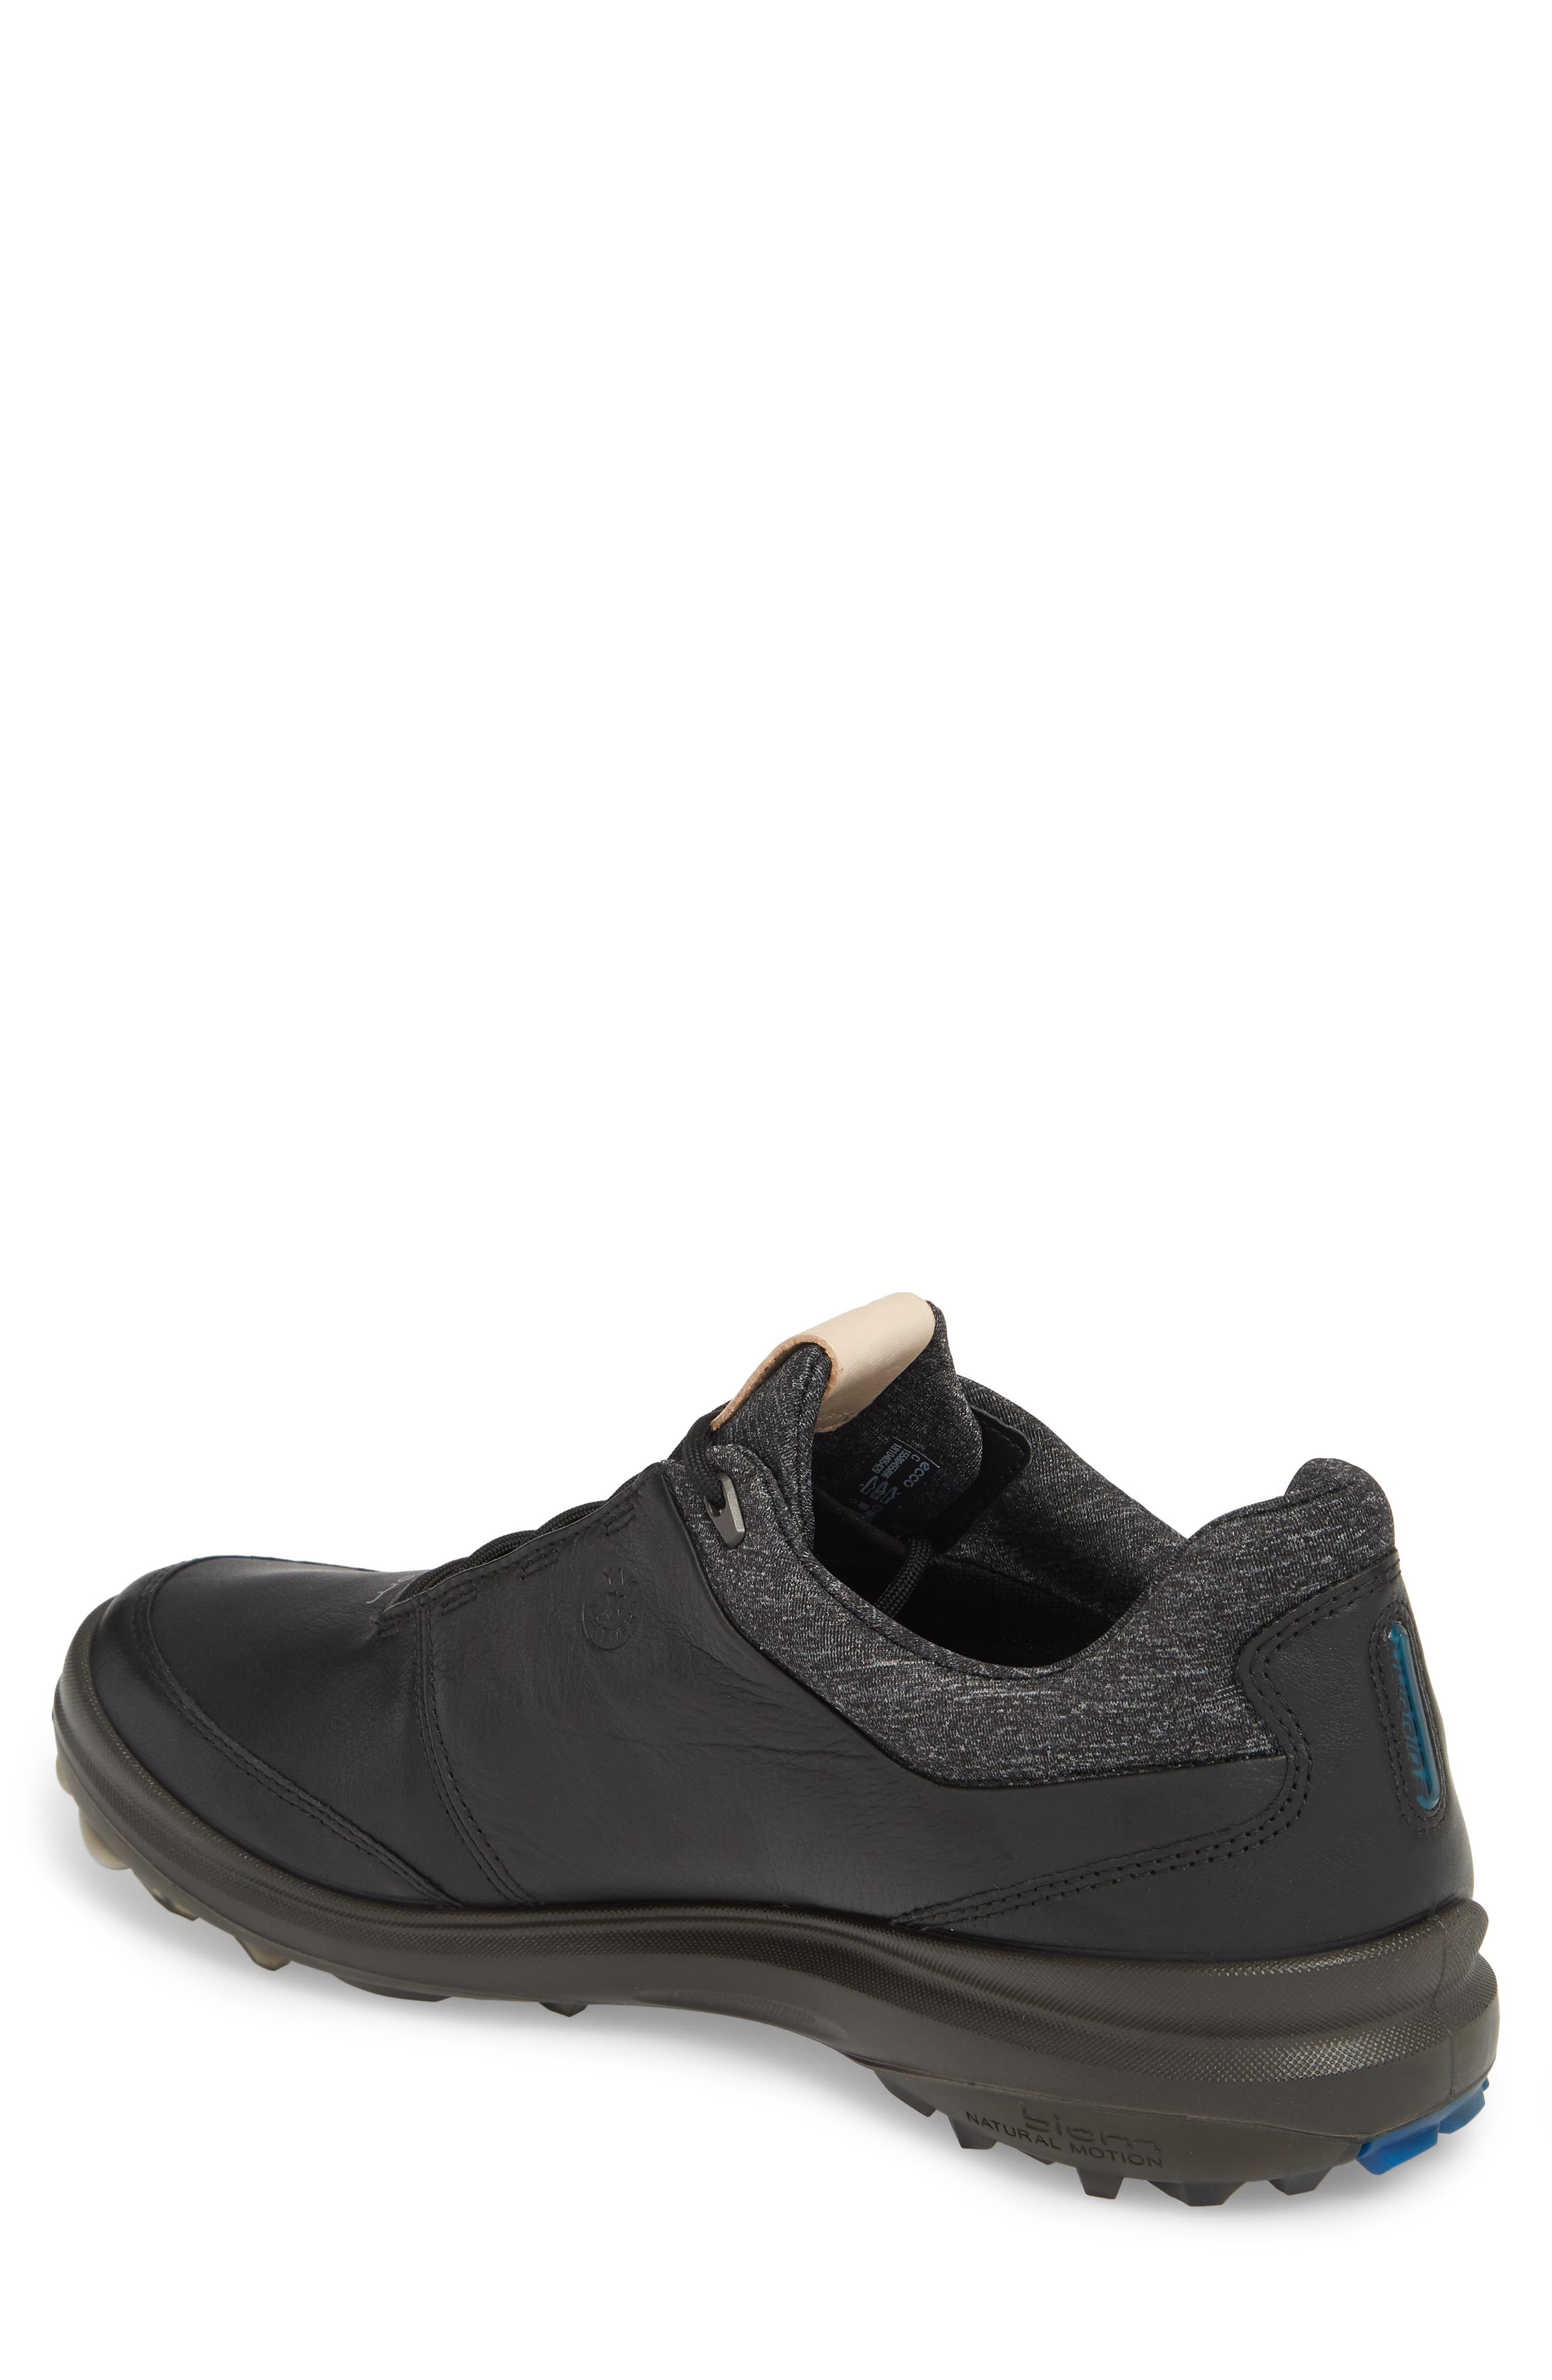 BIOM Hybrid 3 Gore-Tex<sup>®</sup> Golf Shoe,                             Alternate thumbnail 2, color,                             Black/ Bermuda Blue Leather